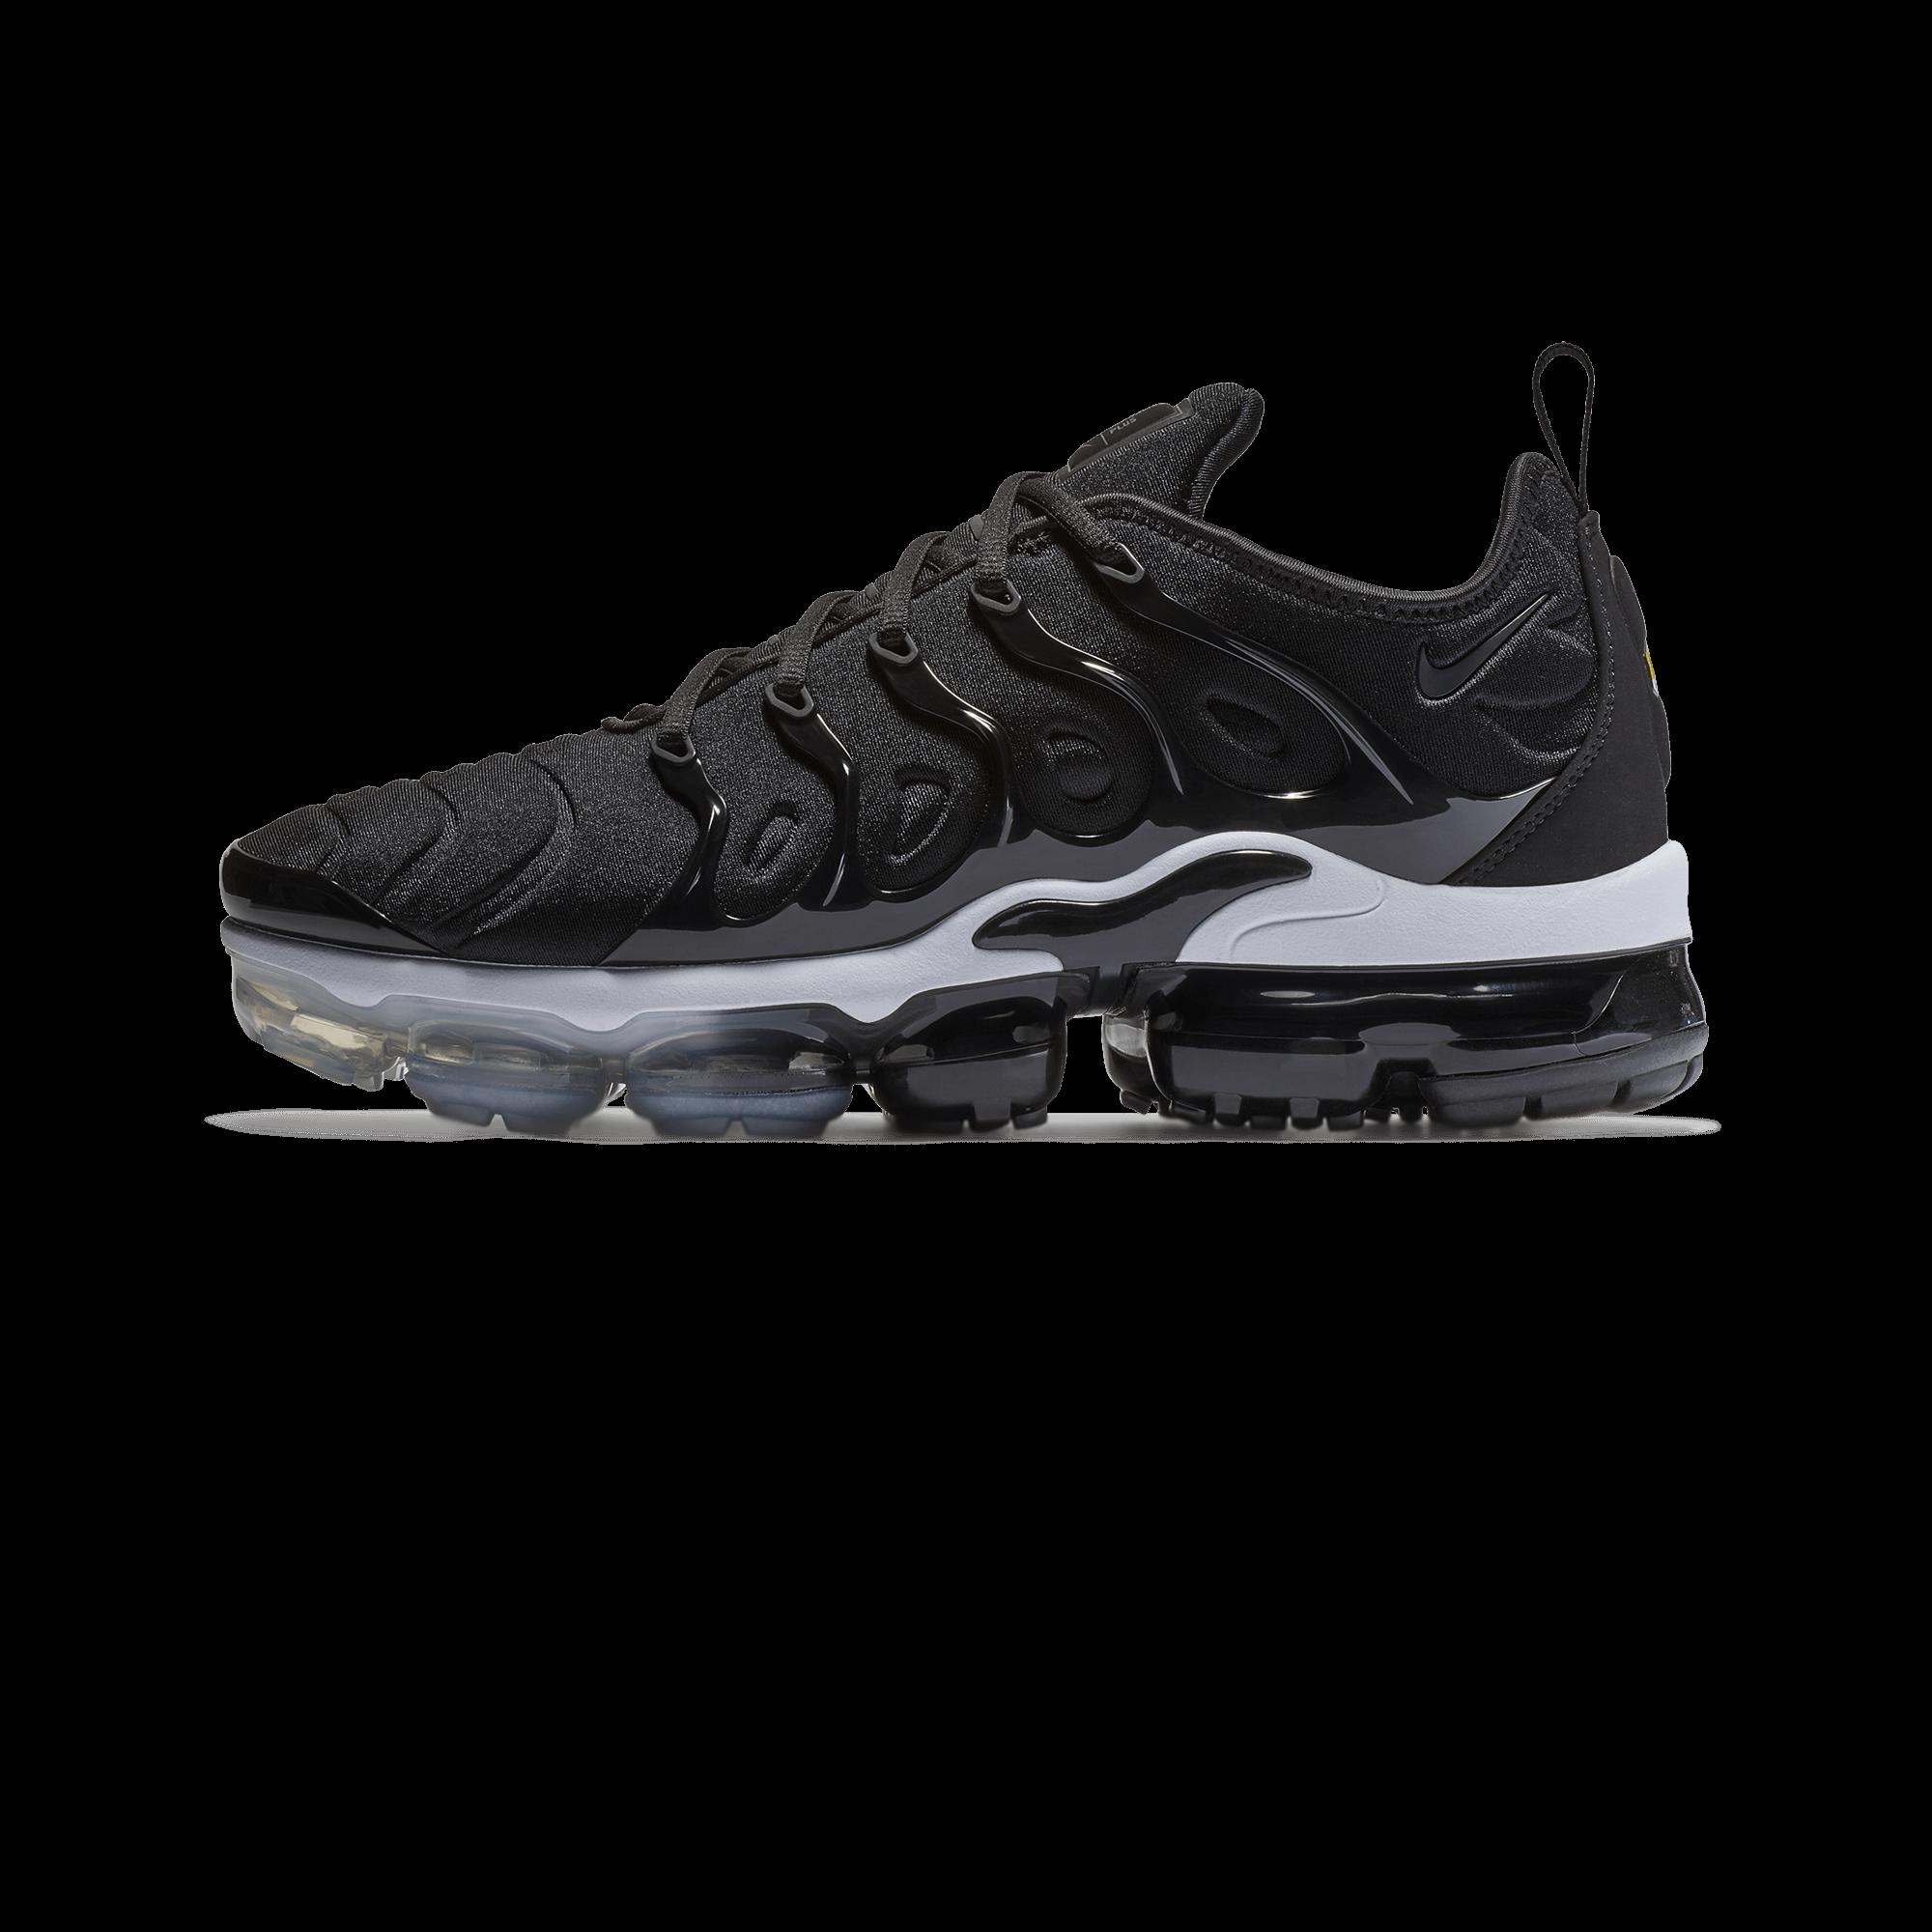 Nike Air Vapormax Plus Mens Running Shoes Black White